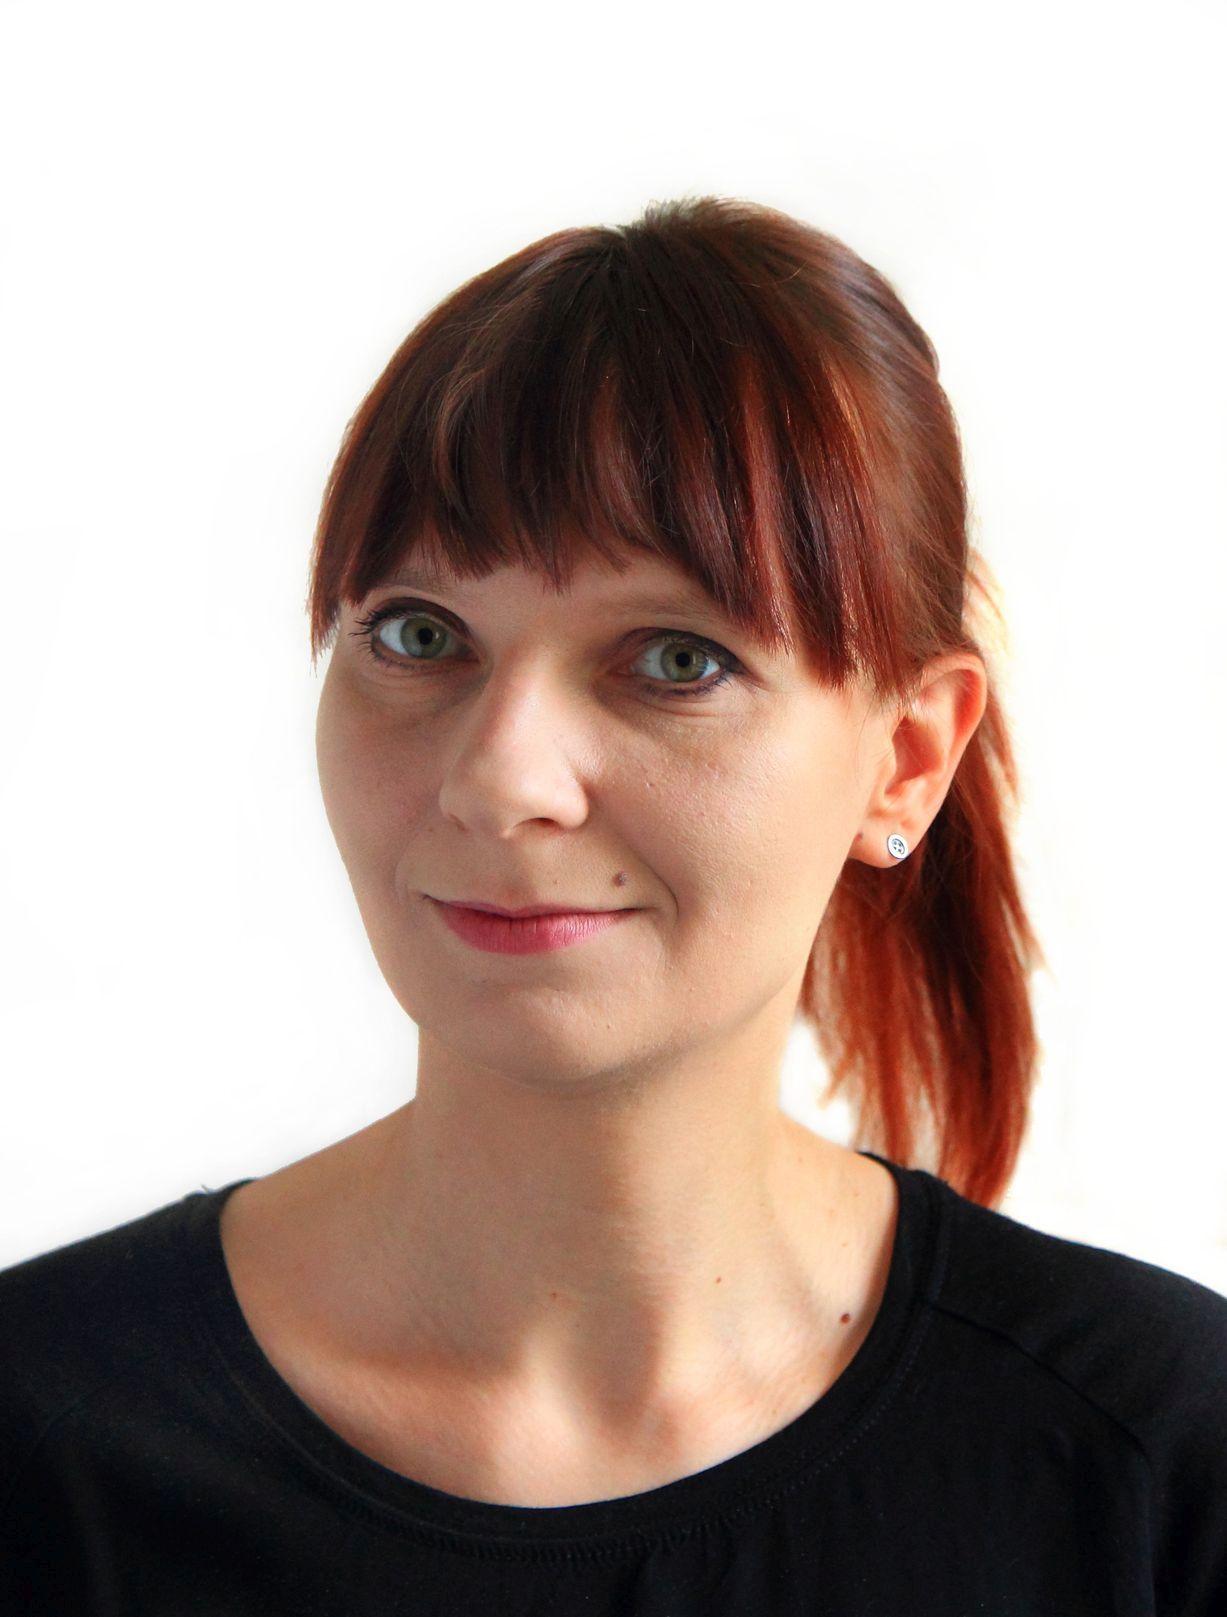 Arleta Wojtczak